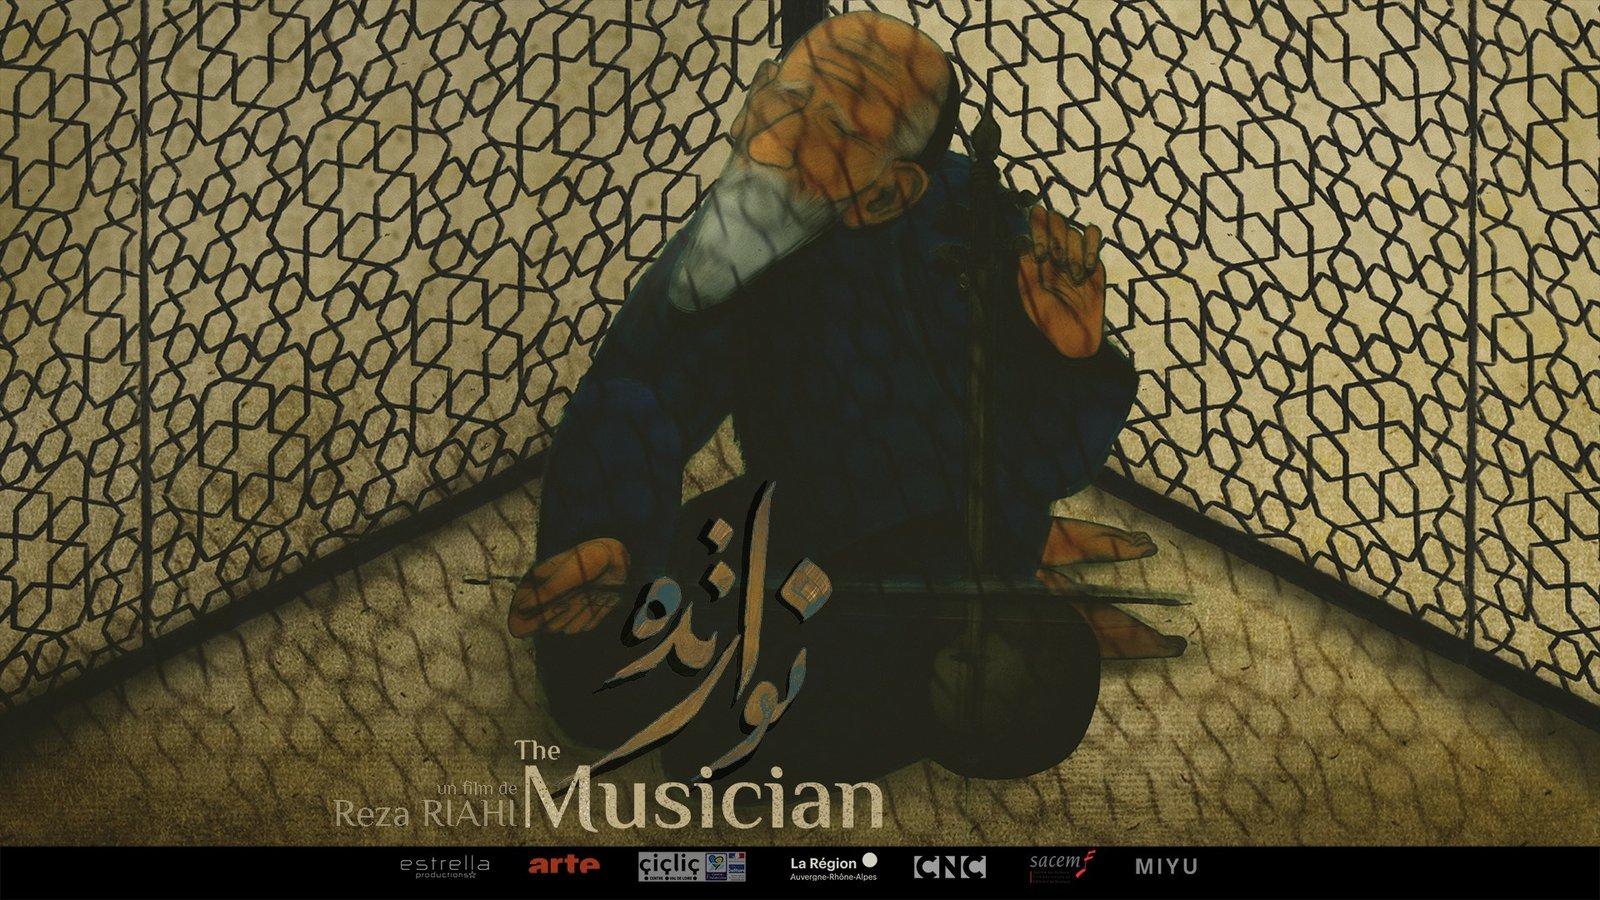 Navozande, the Musician